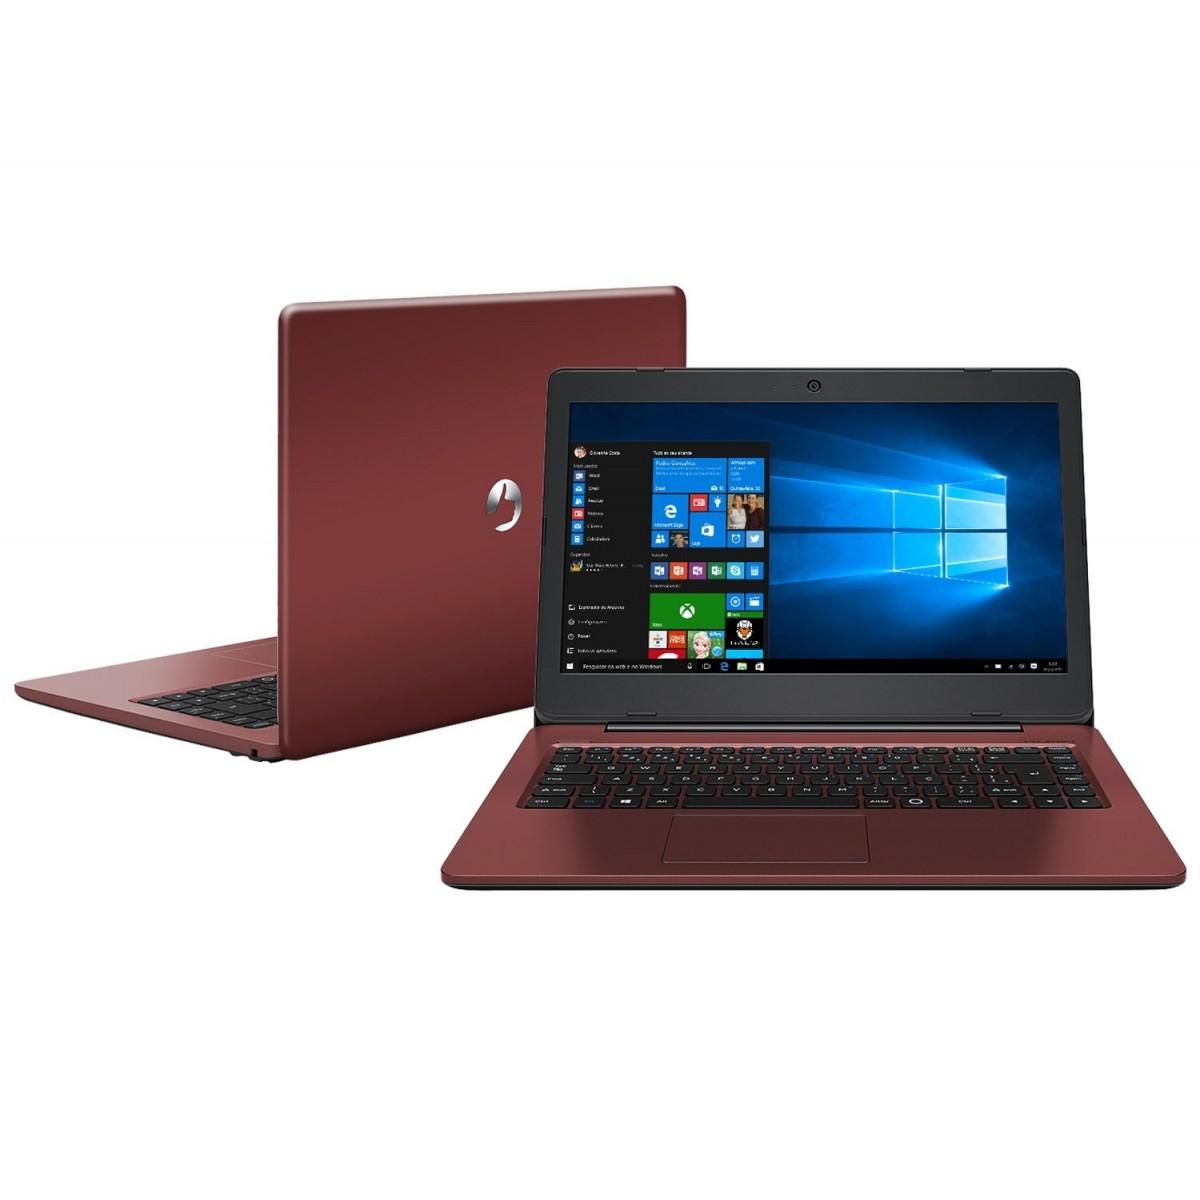 Nb Positivo Stilo Xc3634 Intel N3010 2,4Ghz|4Gb|32Gb|14|W10Home Vermelho